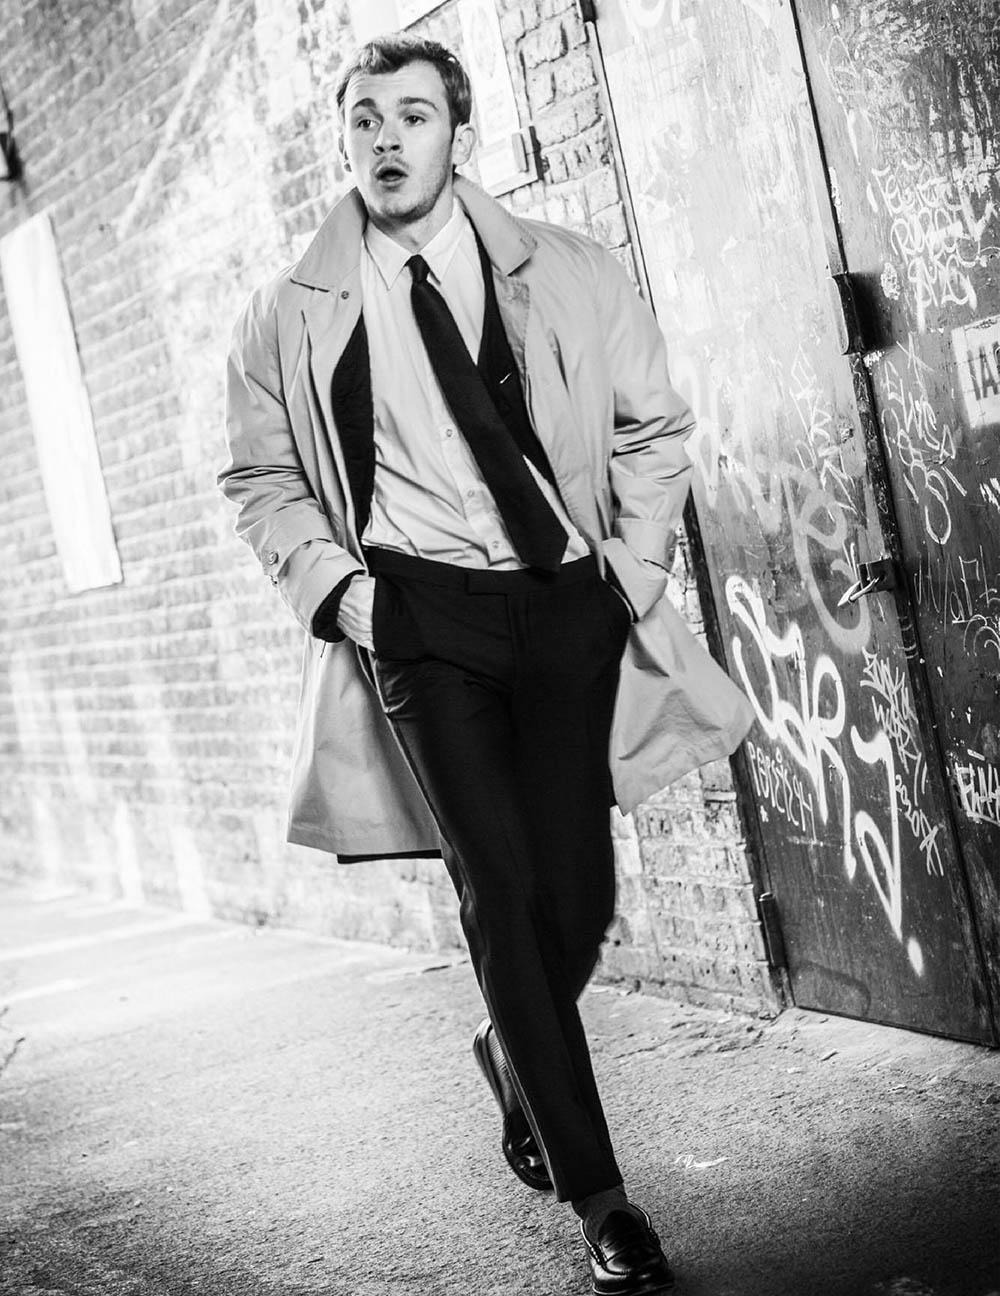 Harry Lawtey covers Man of Metropolis November 2020 by Lee Malone